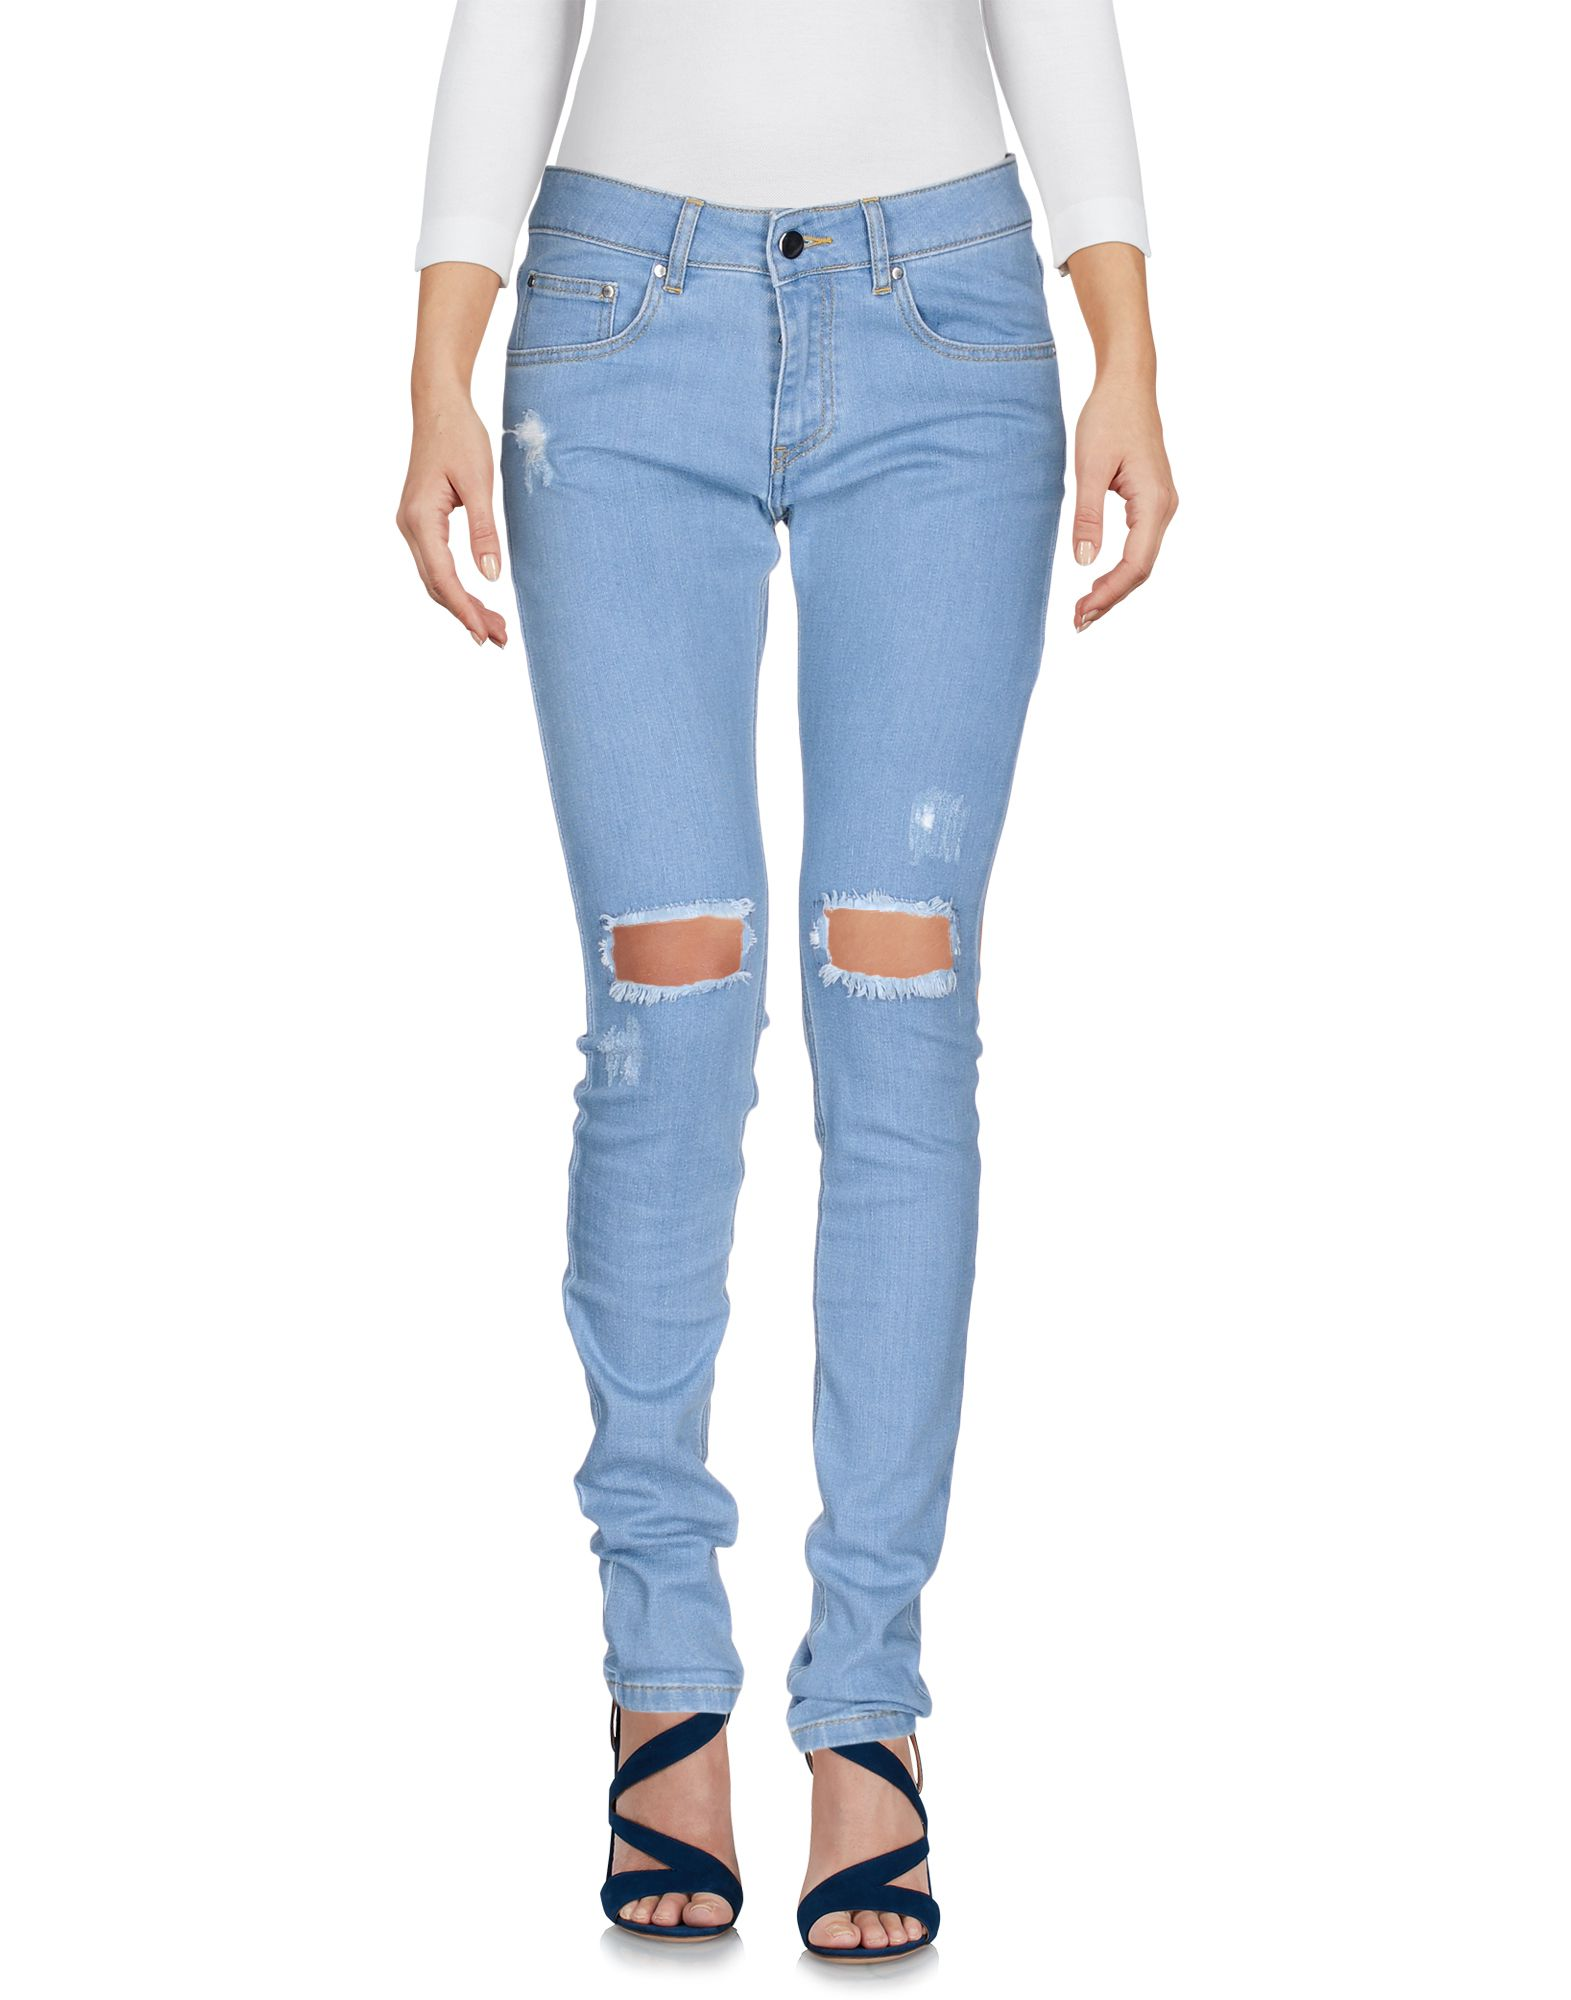 FAP FILLES A PAPA Damen Jeanshose Farbe Blau Größe 5 jetztbilligerkaufen